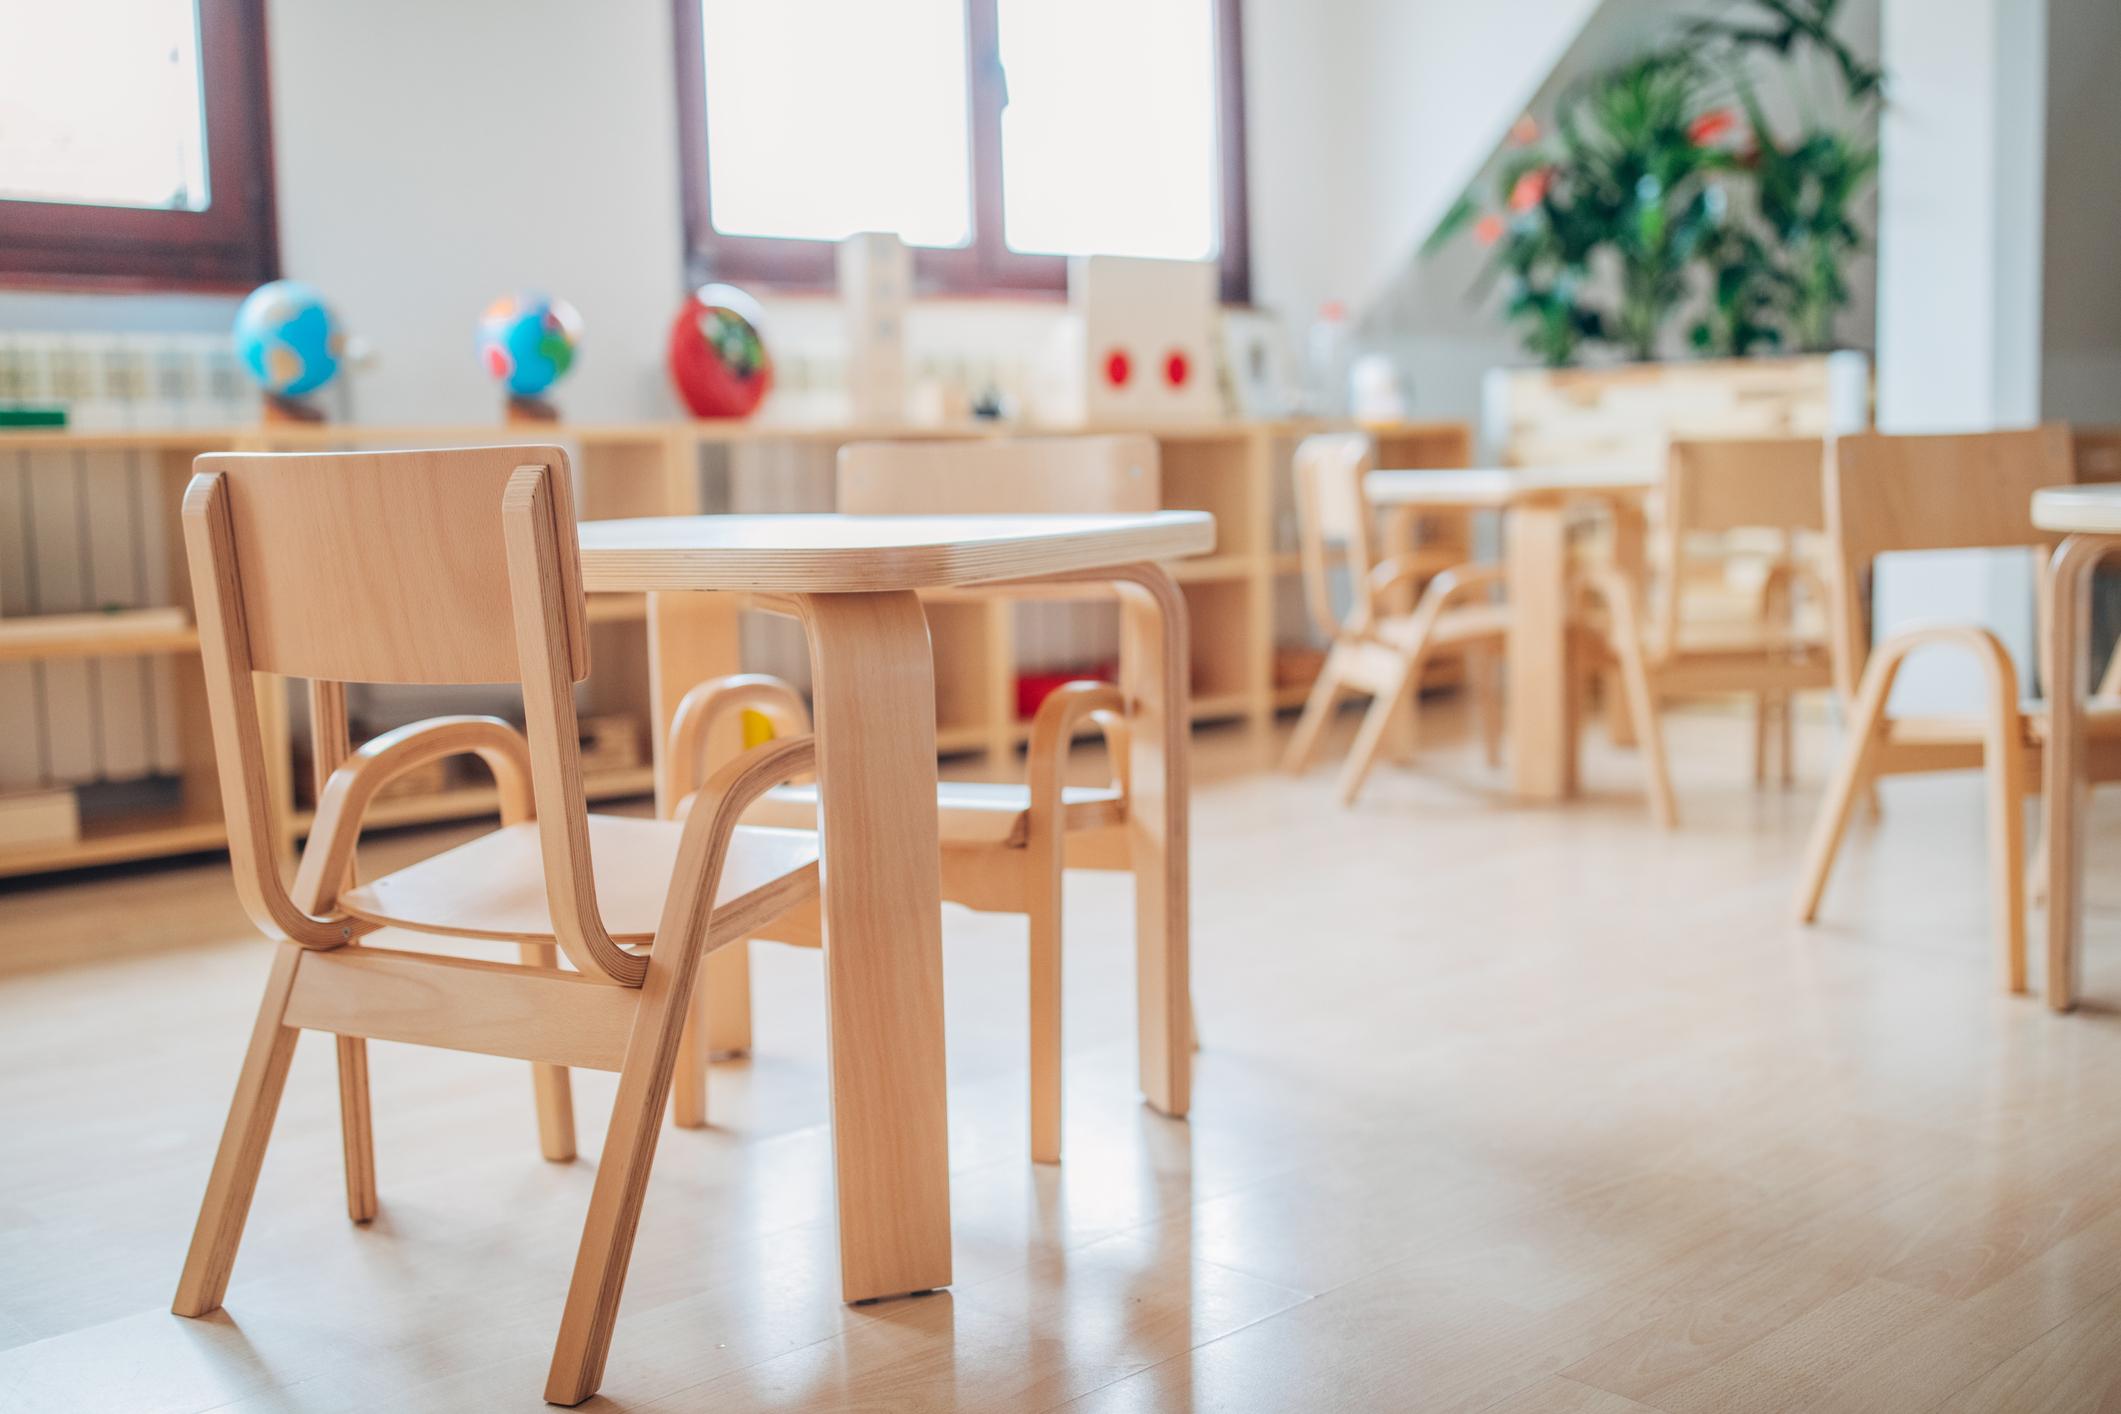 Iowa child care crisis continues despite legislative pushes